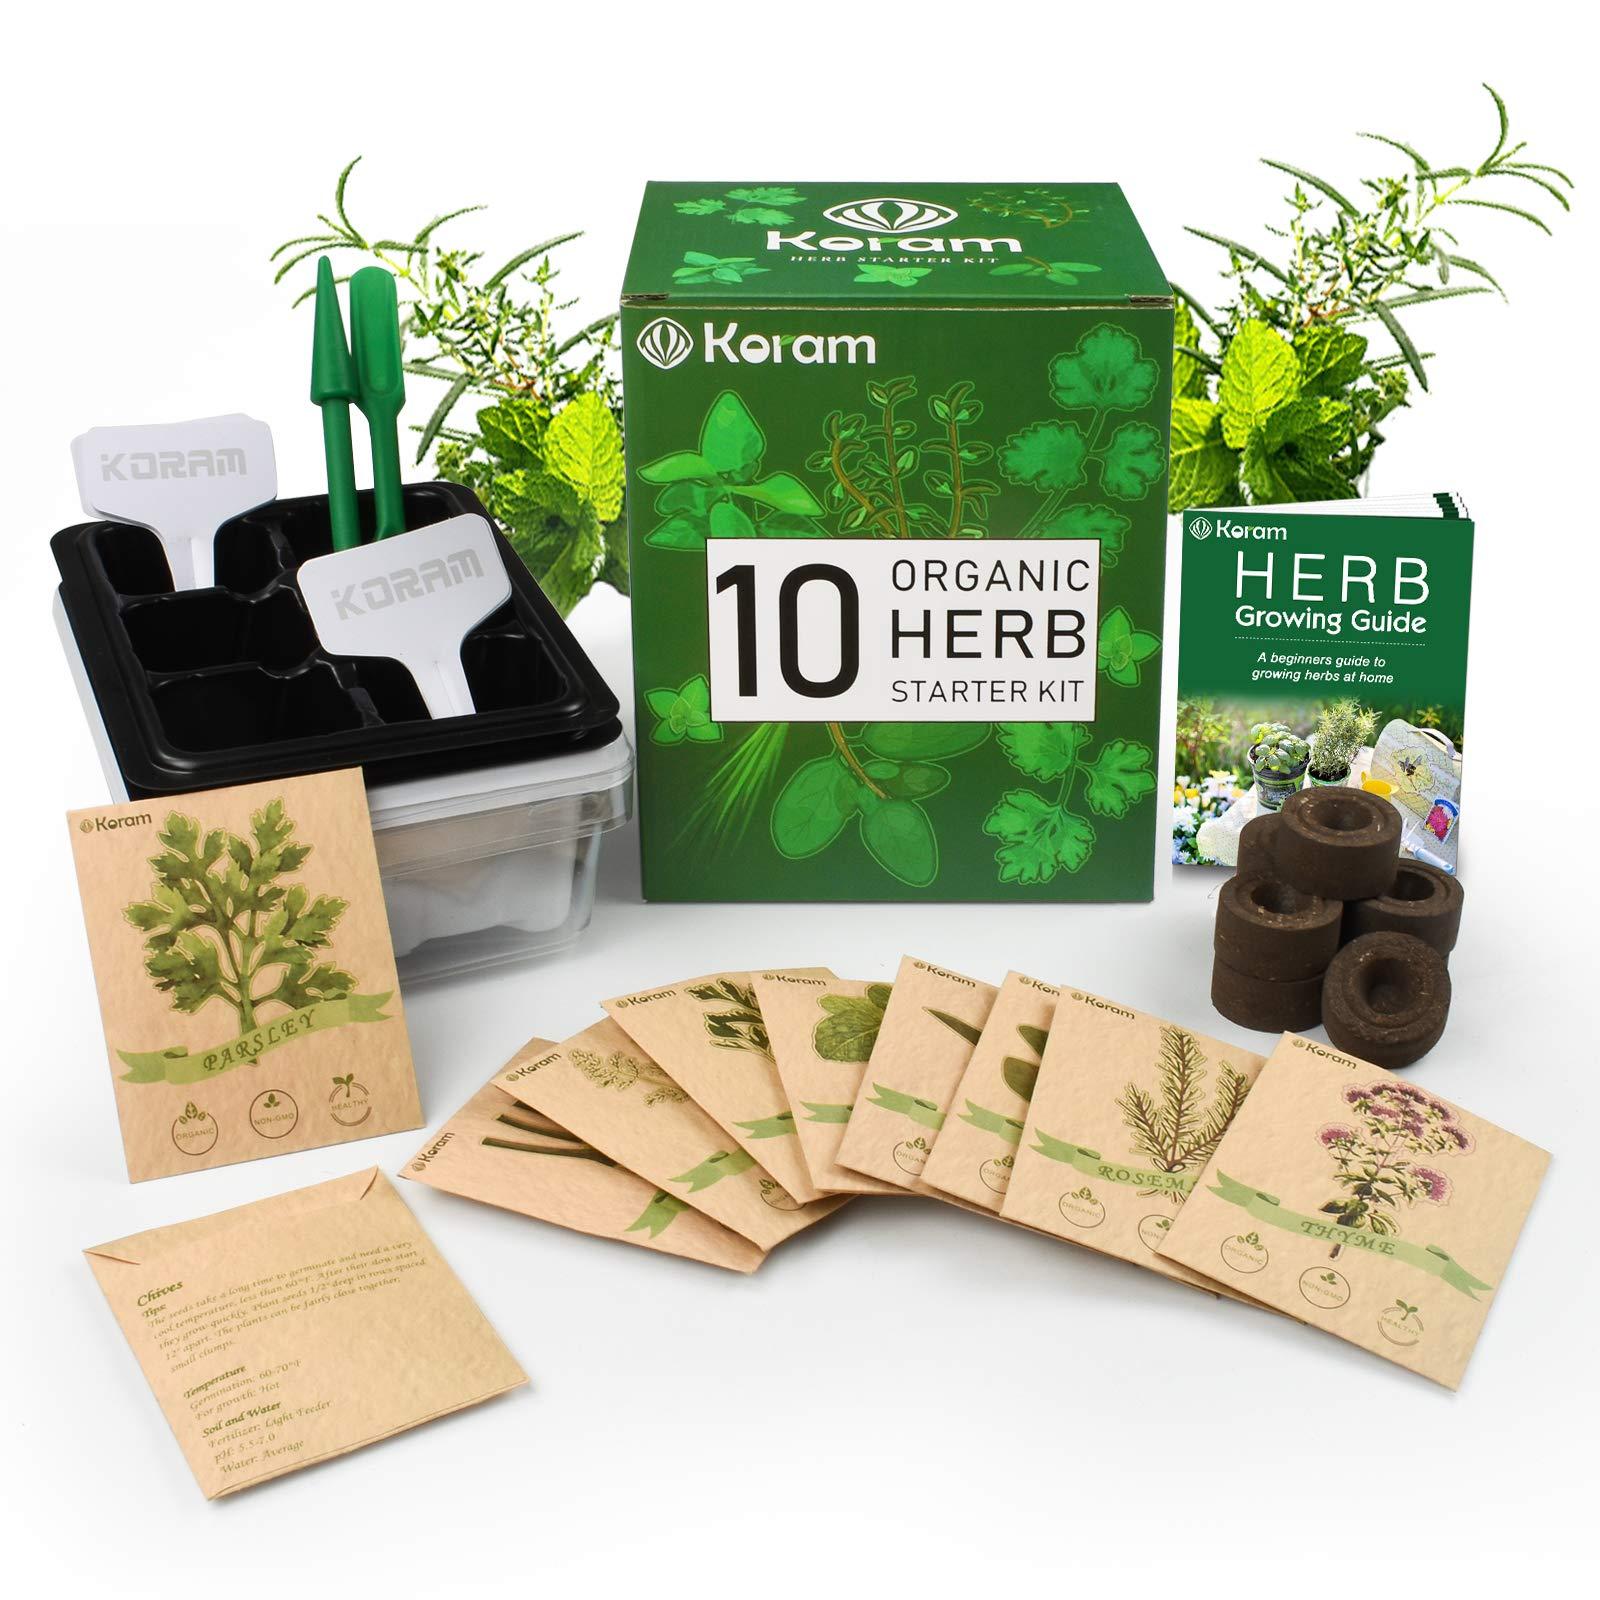 KORAM Herb Garden Kit Growing Kit Gardening Starter Set- 10 Herbs Grow from Organic Seeds Indoor Herb Kit with Everything a Gardener Needs for Growing Herbs Indoors, Kitchen, Balcony, Window Sill